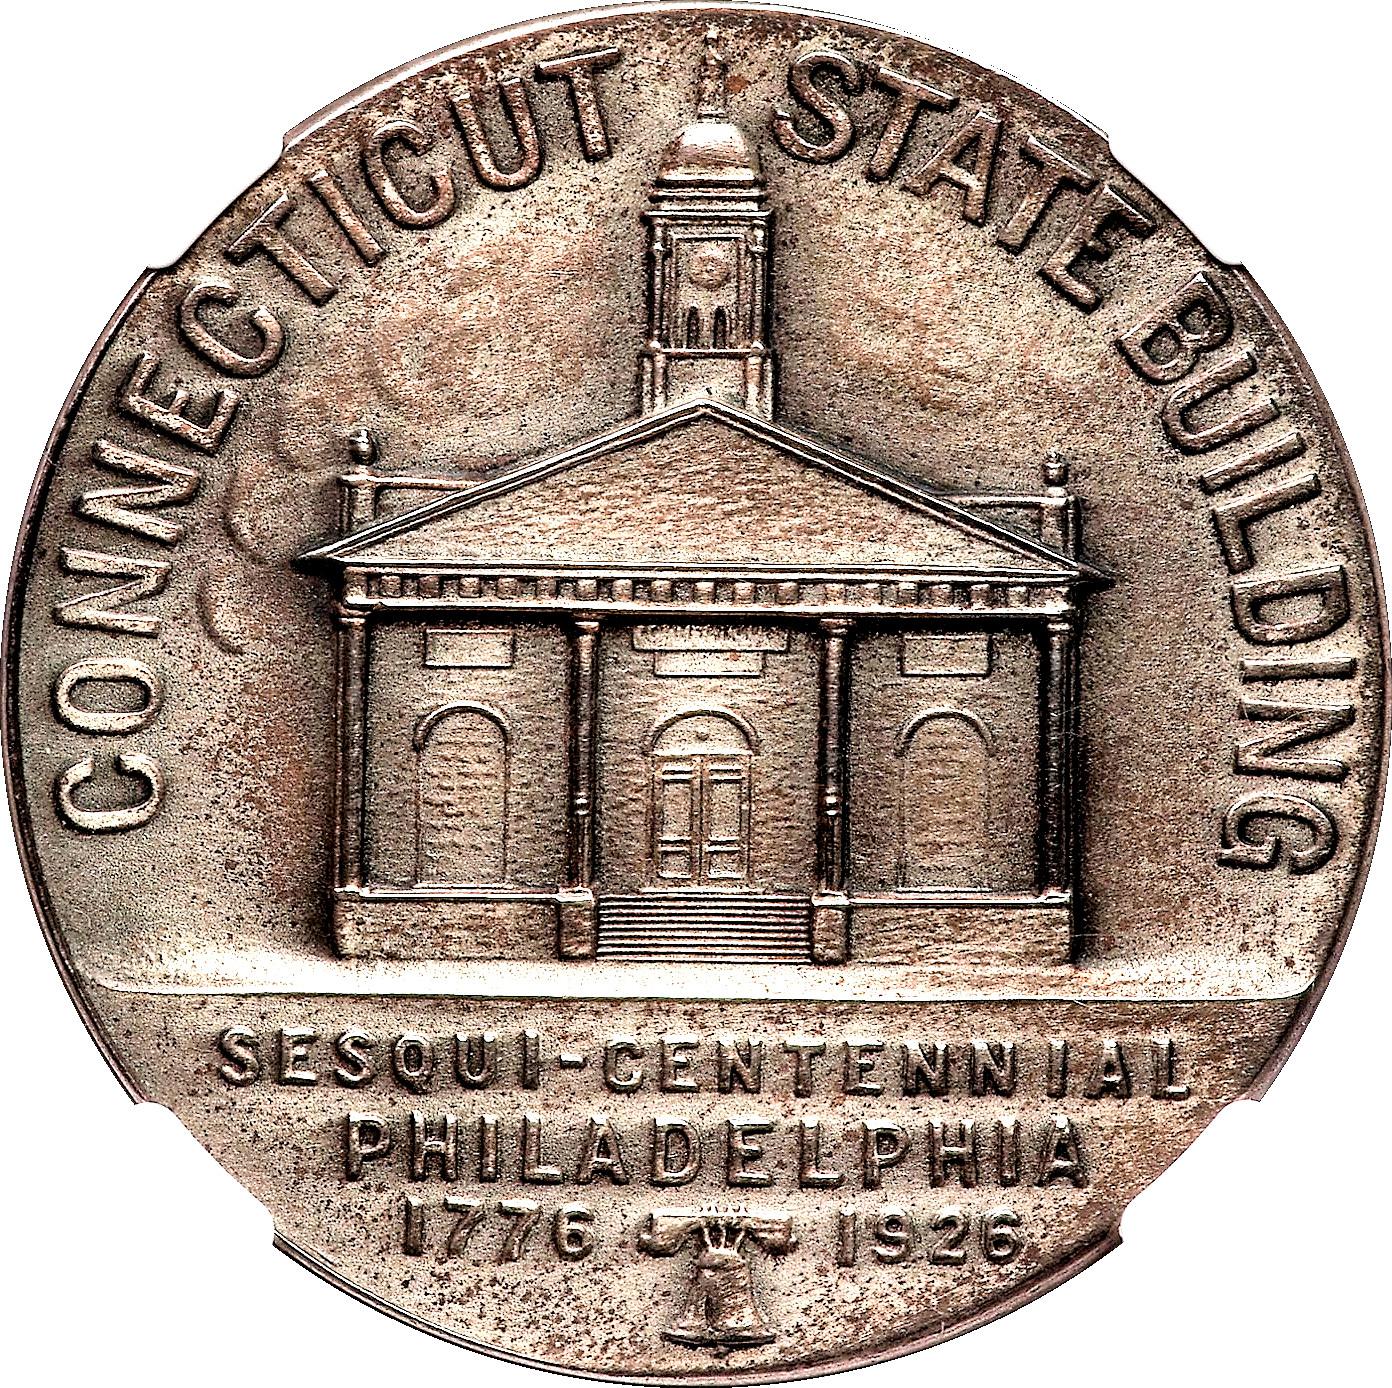 1926 MEDALLION SESQUI-CENTENNIAL PHILADELPHIA PENNSYLVANIA CT STATE BUILDING